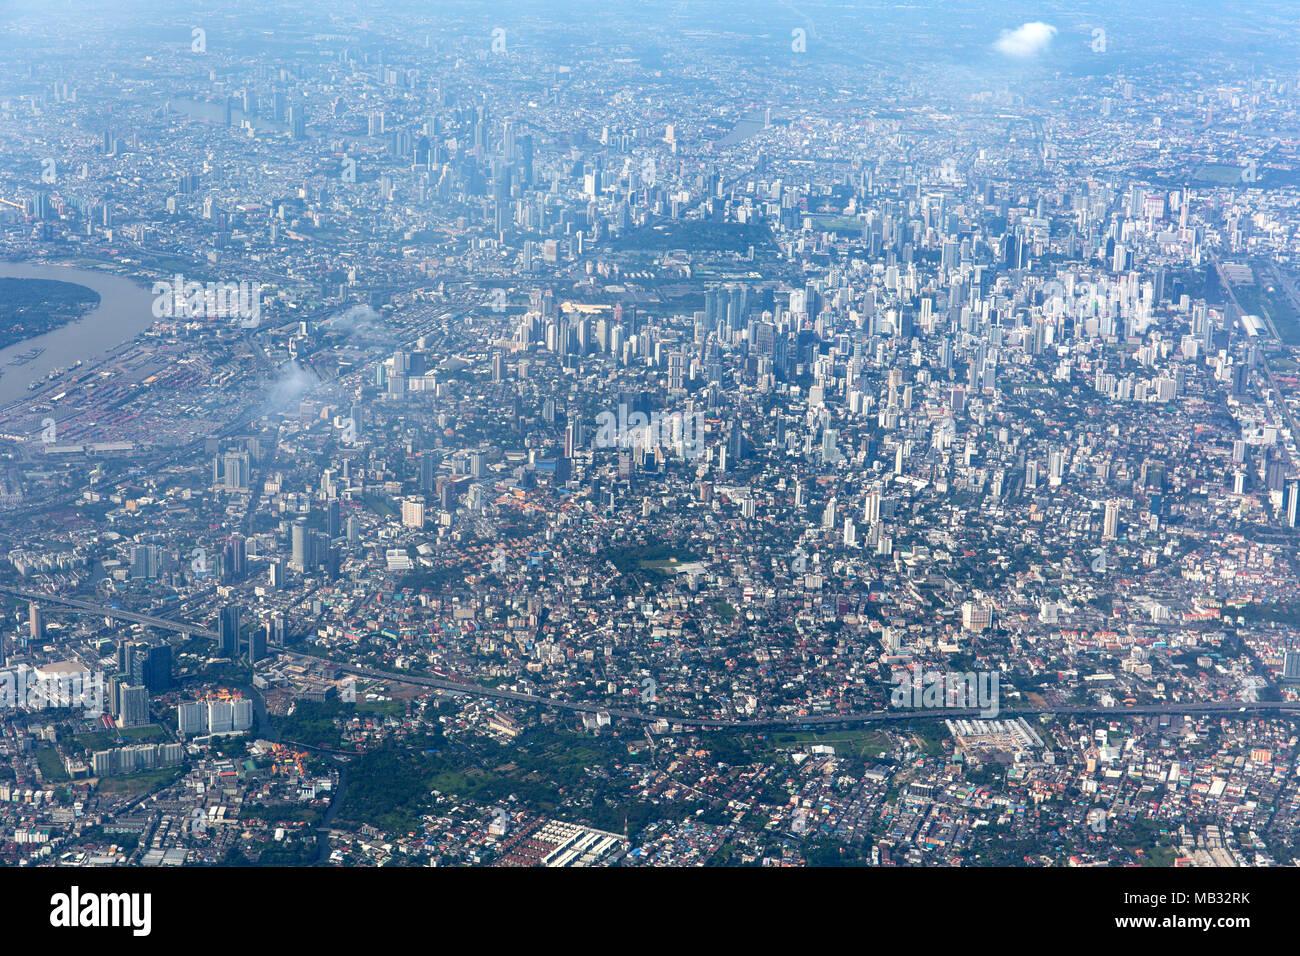 View of city centre, aerial view, Bangkok, Thailand - Stock Image